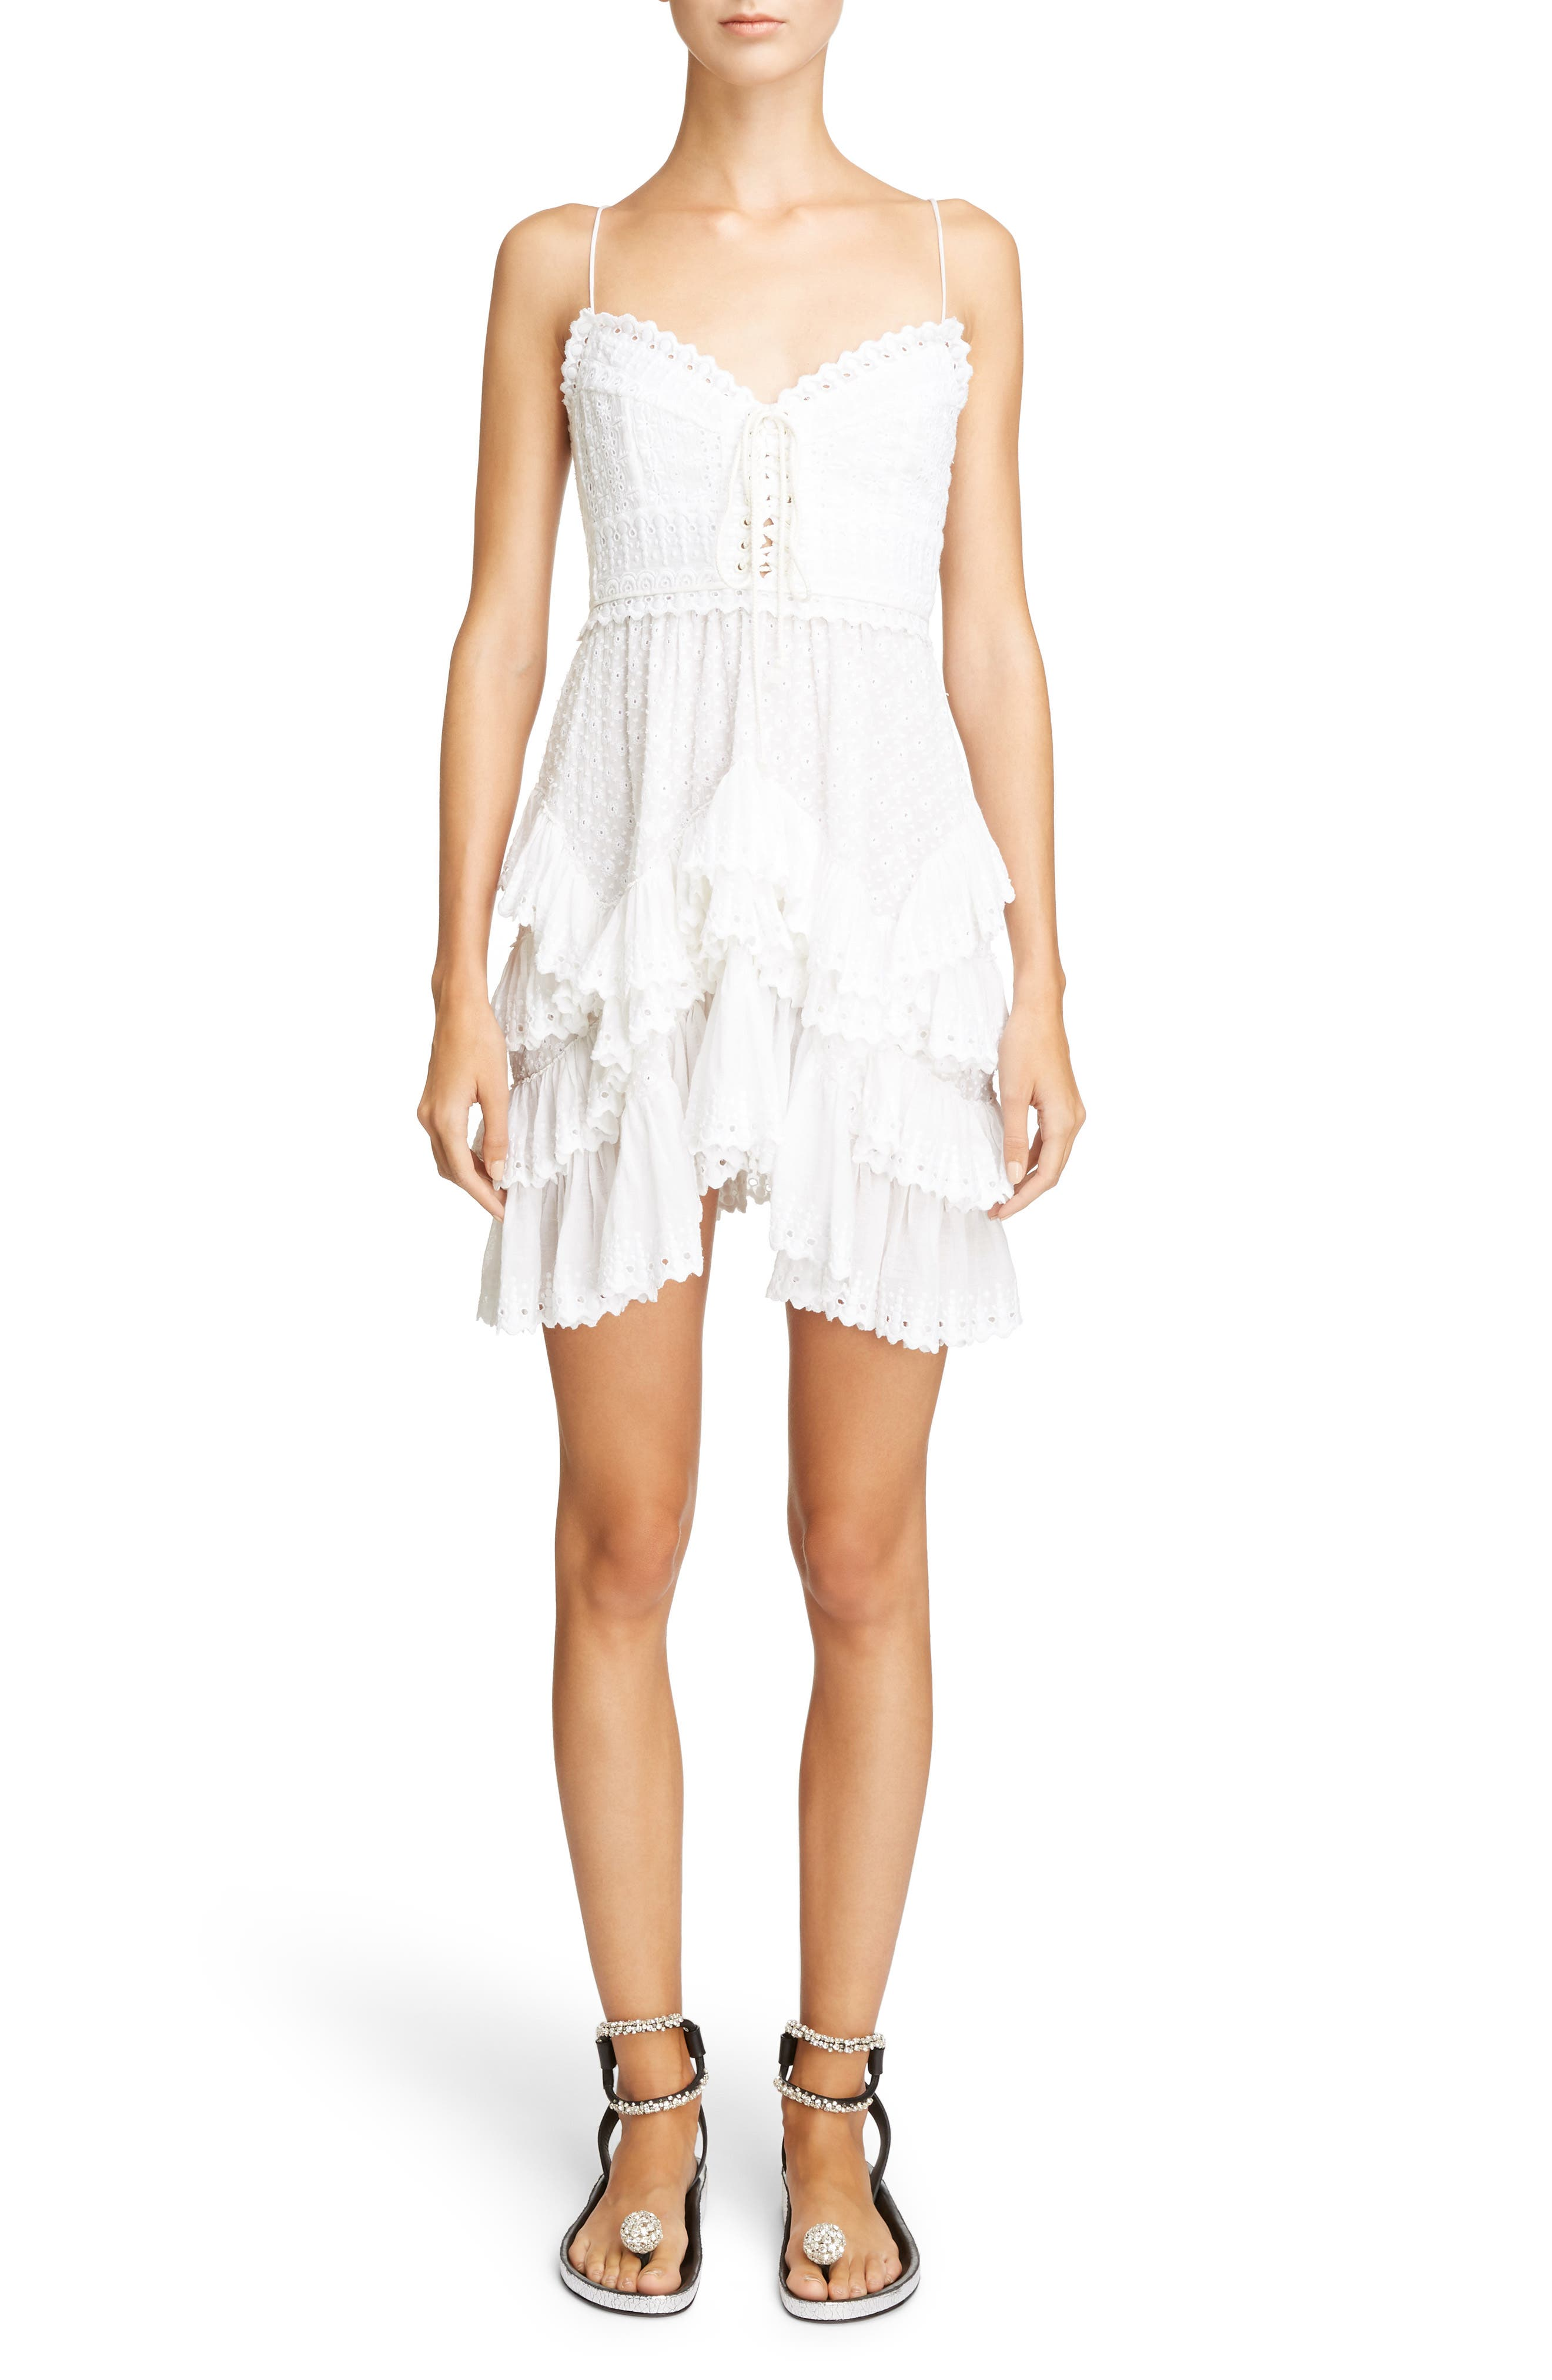 Isabel Marant Ruffle Skirt Broderie Anglaise Dress